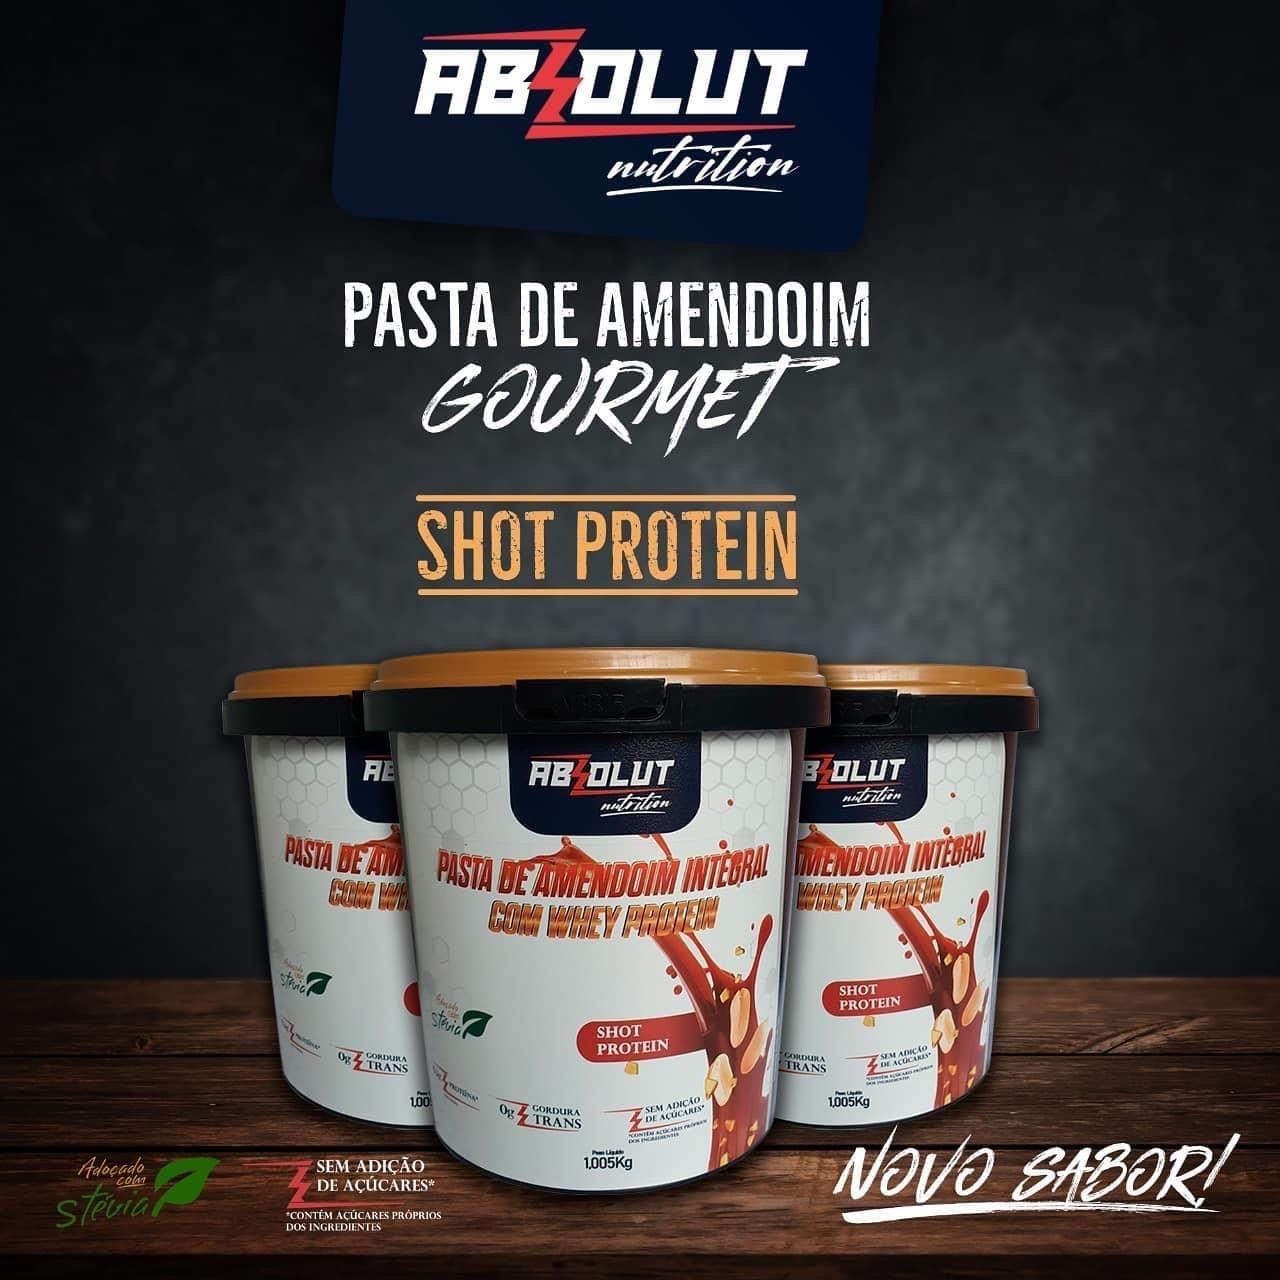 PASTA DE AMENDOIM GOURMET SHOT PROTEIN 500G - ABS NUTRITION